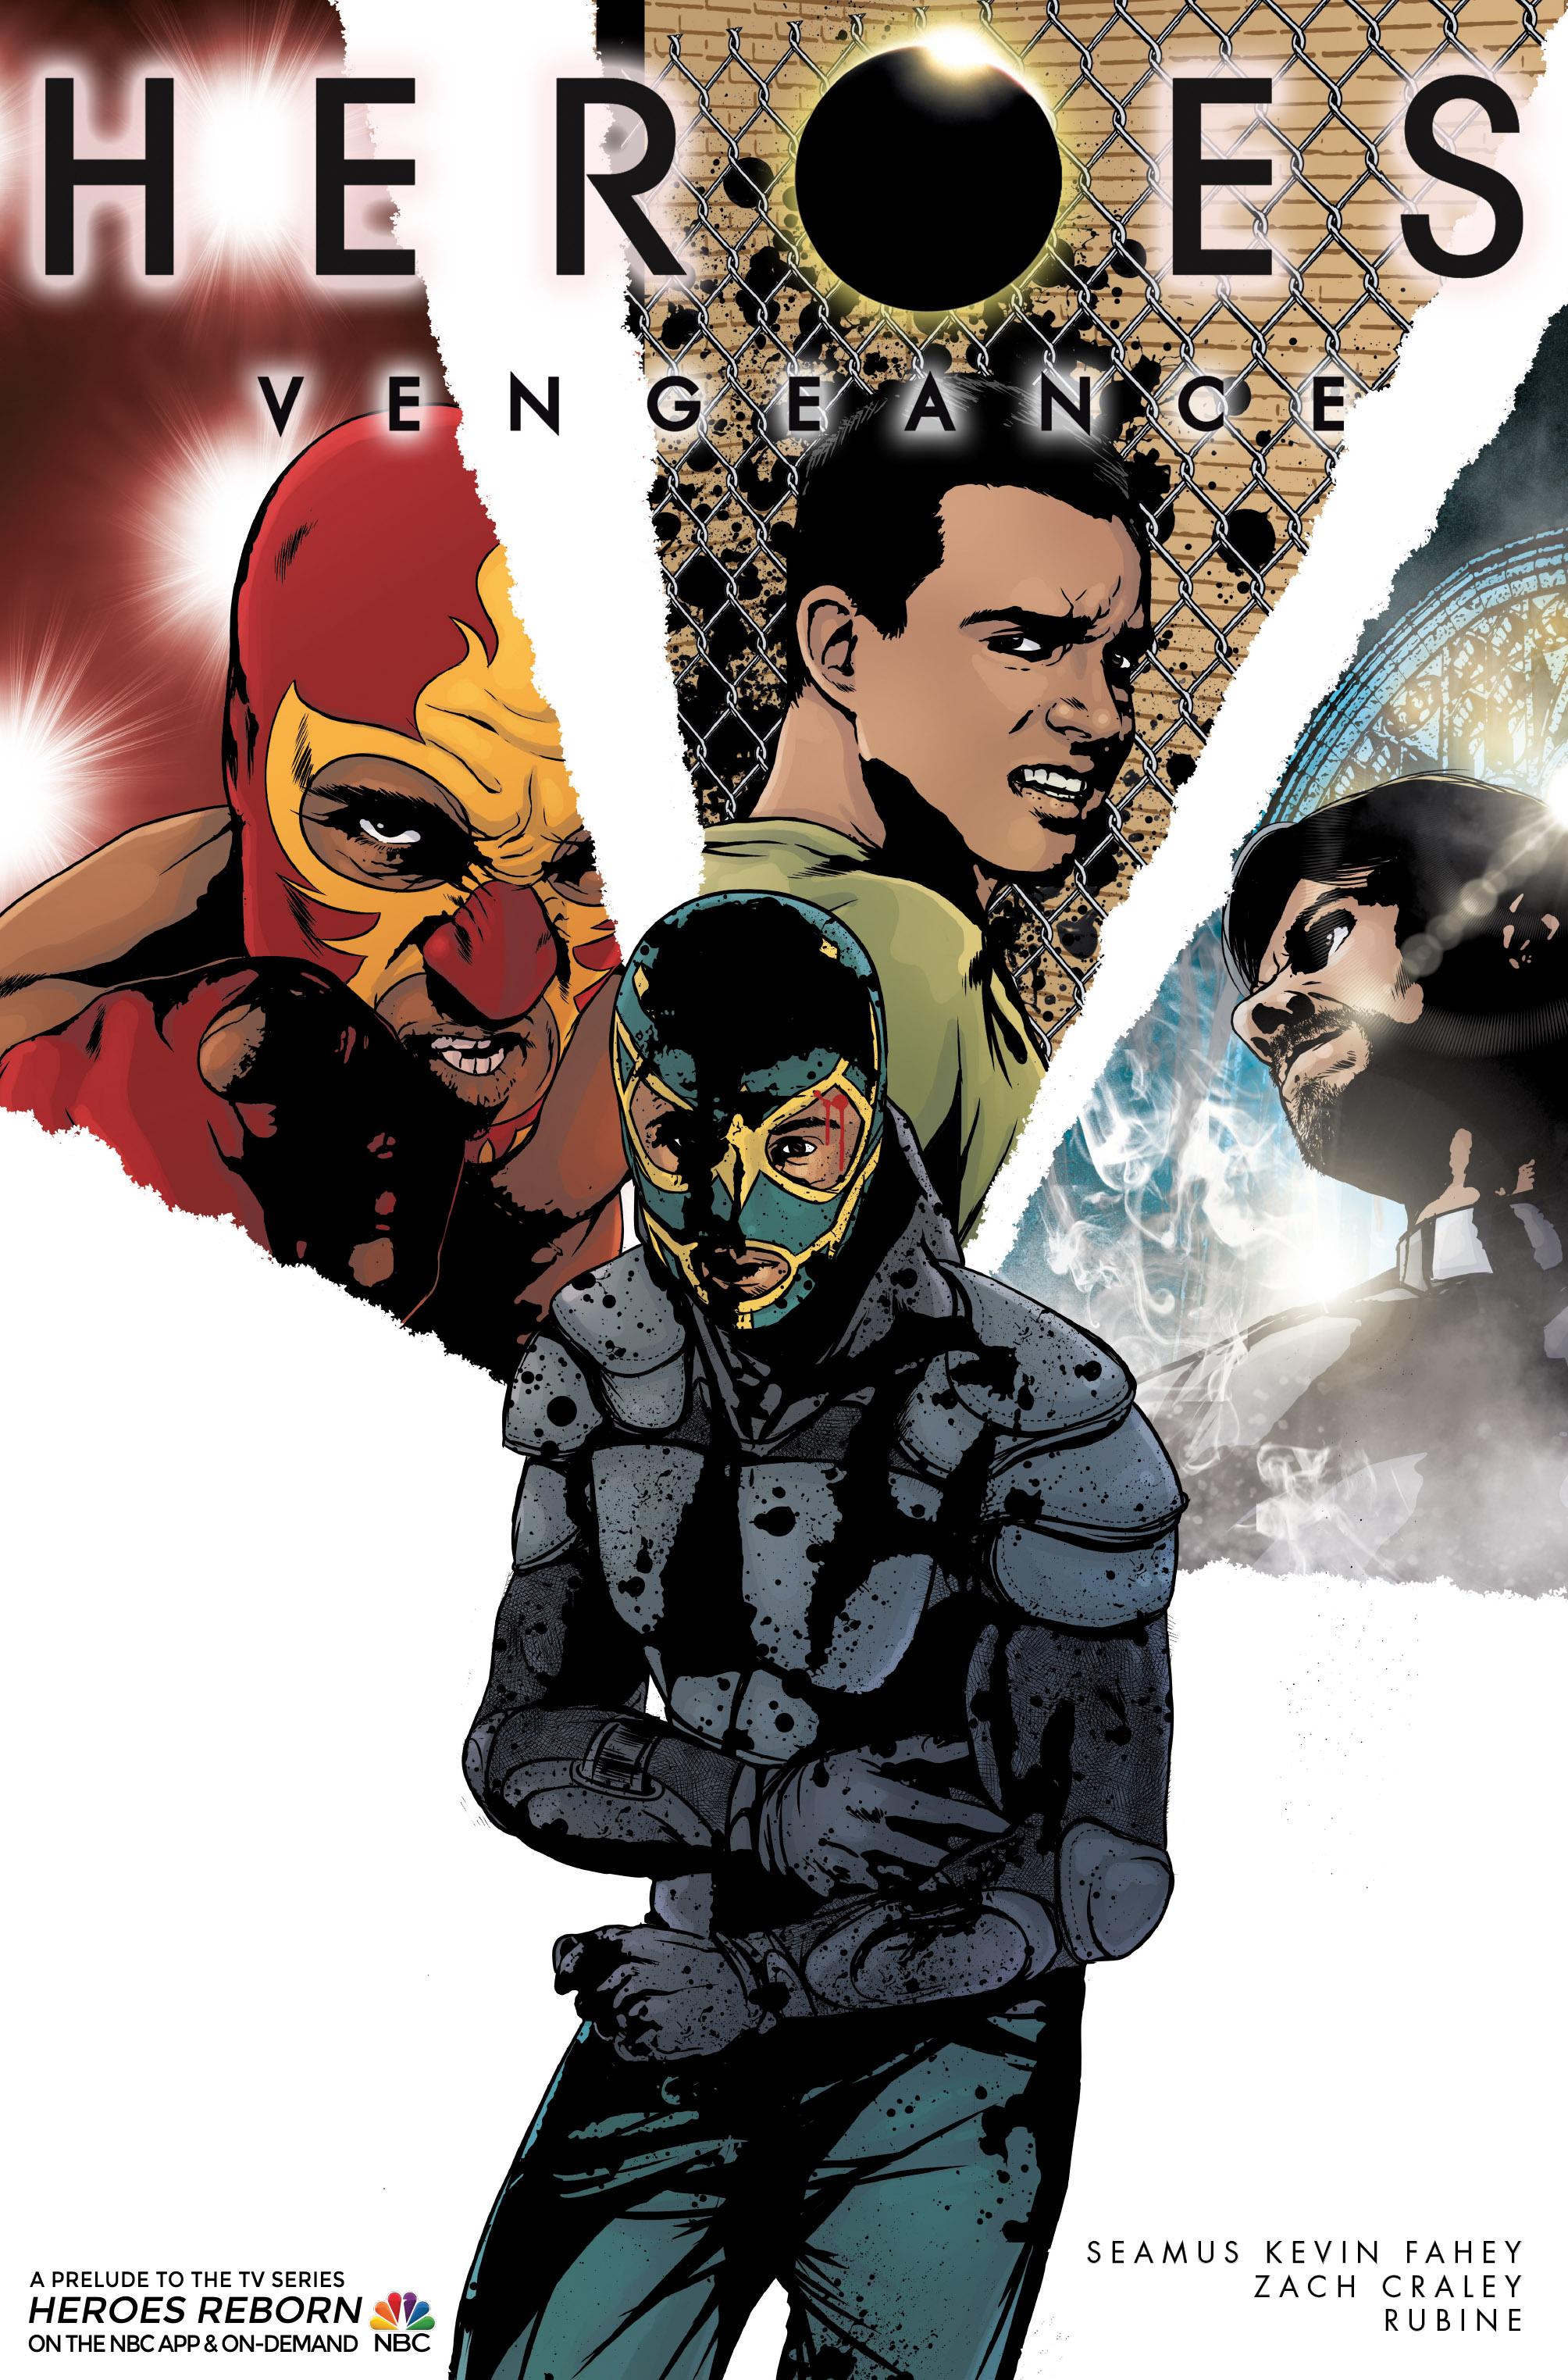 Heroes Vengeance #4 Cover